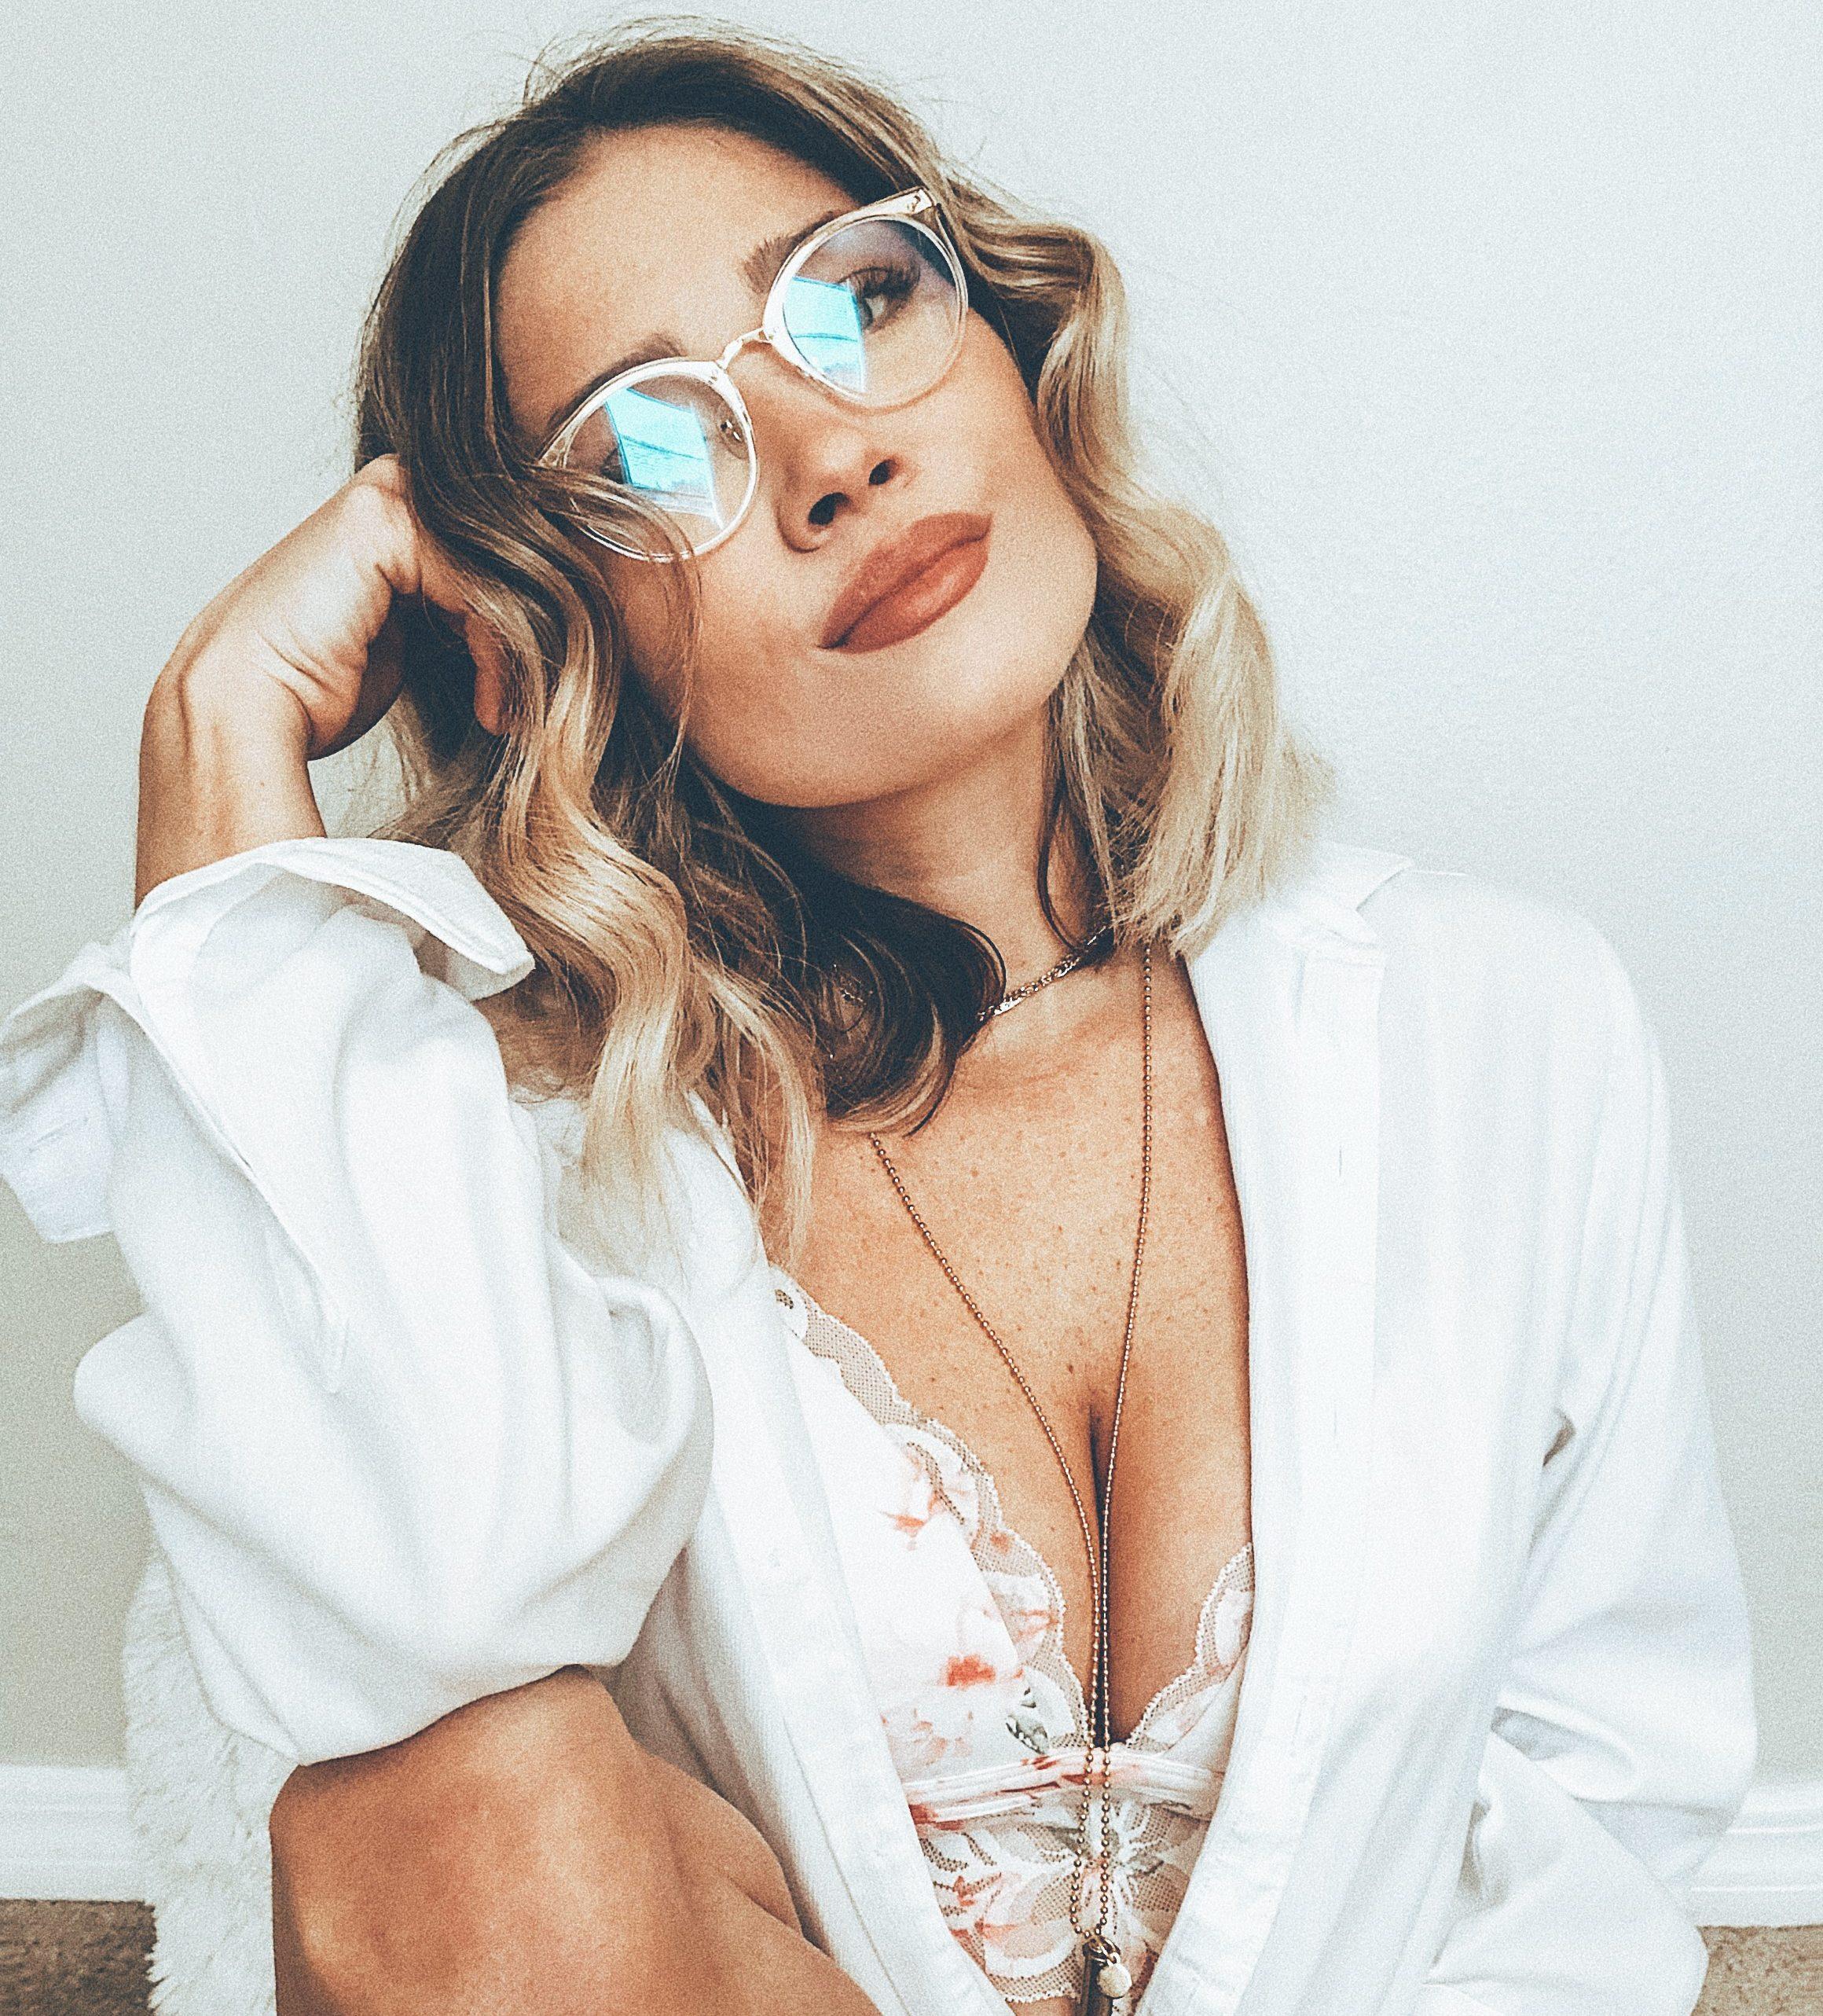 Britt Kay